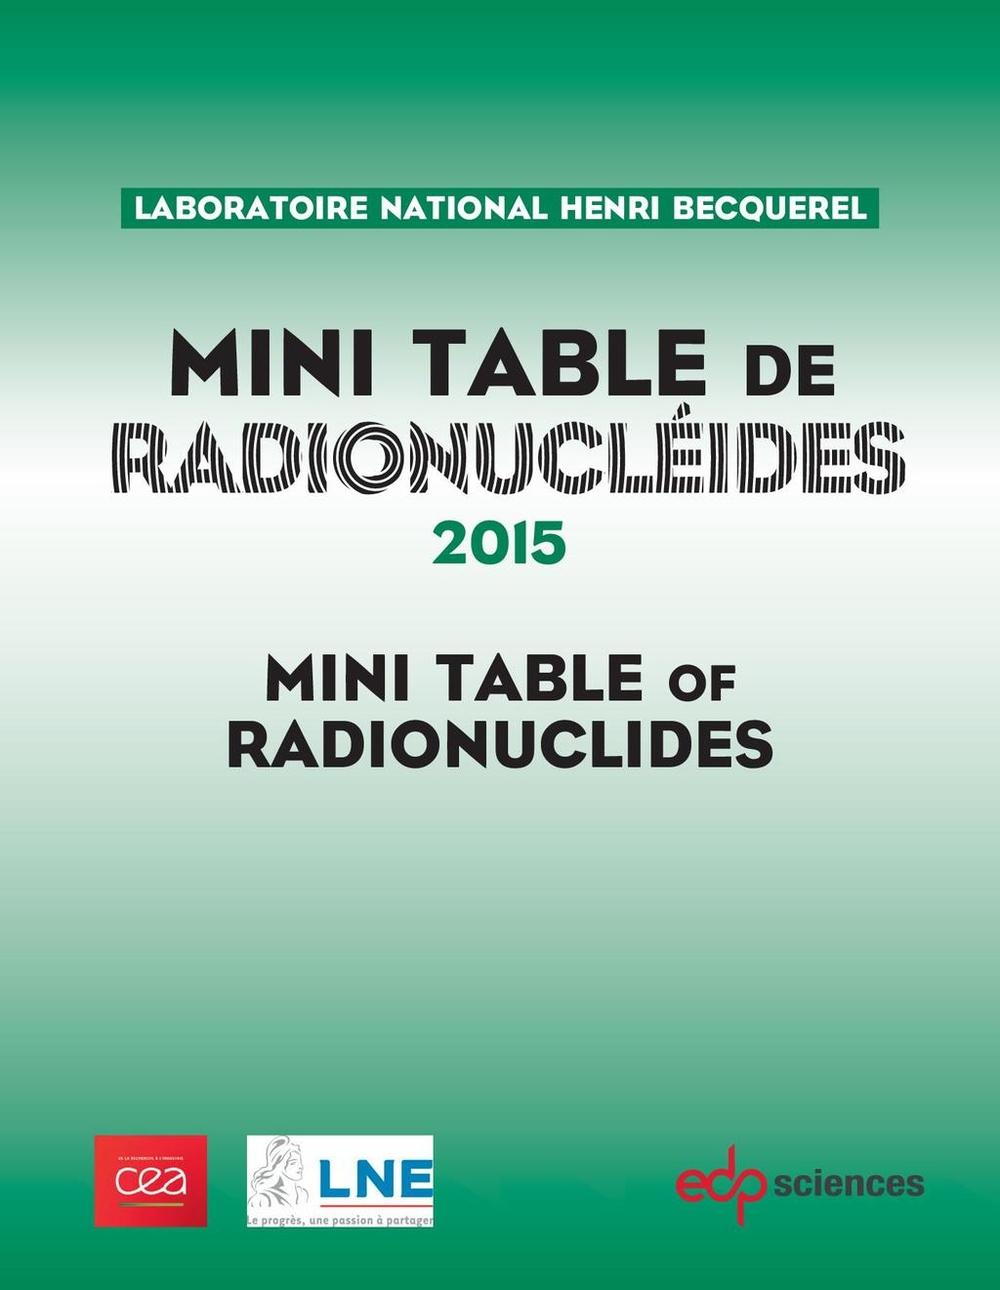 Mini Table de radionucléides 2015